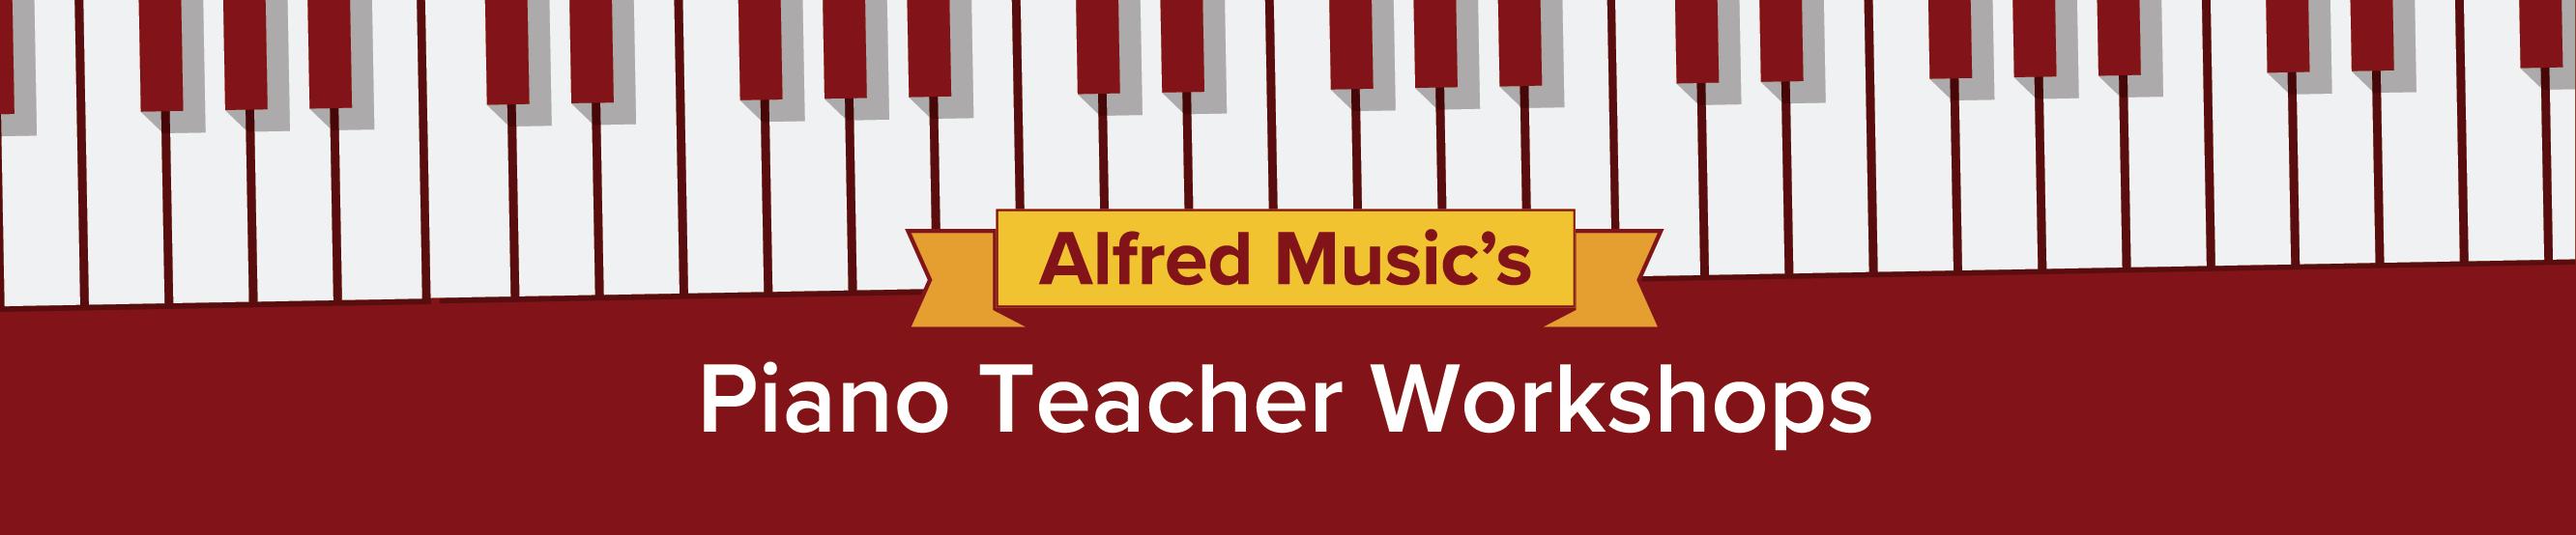 Alfred Music's Piano Teacher Workshops banner